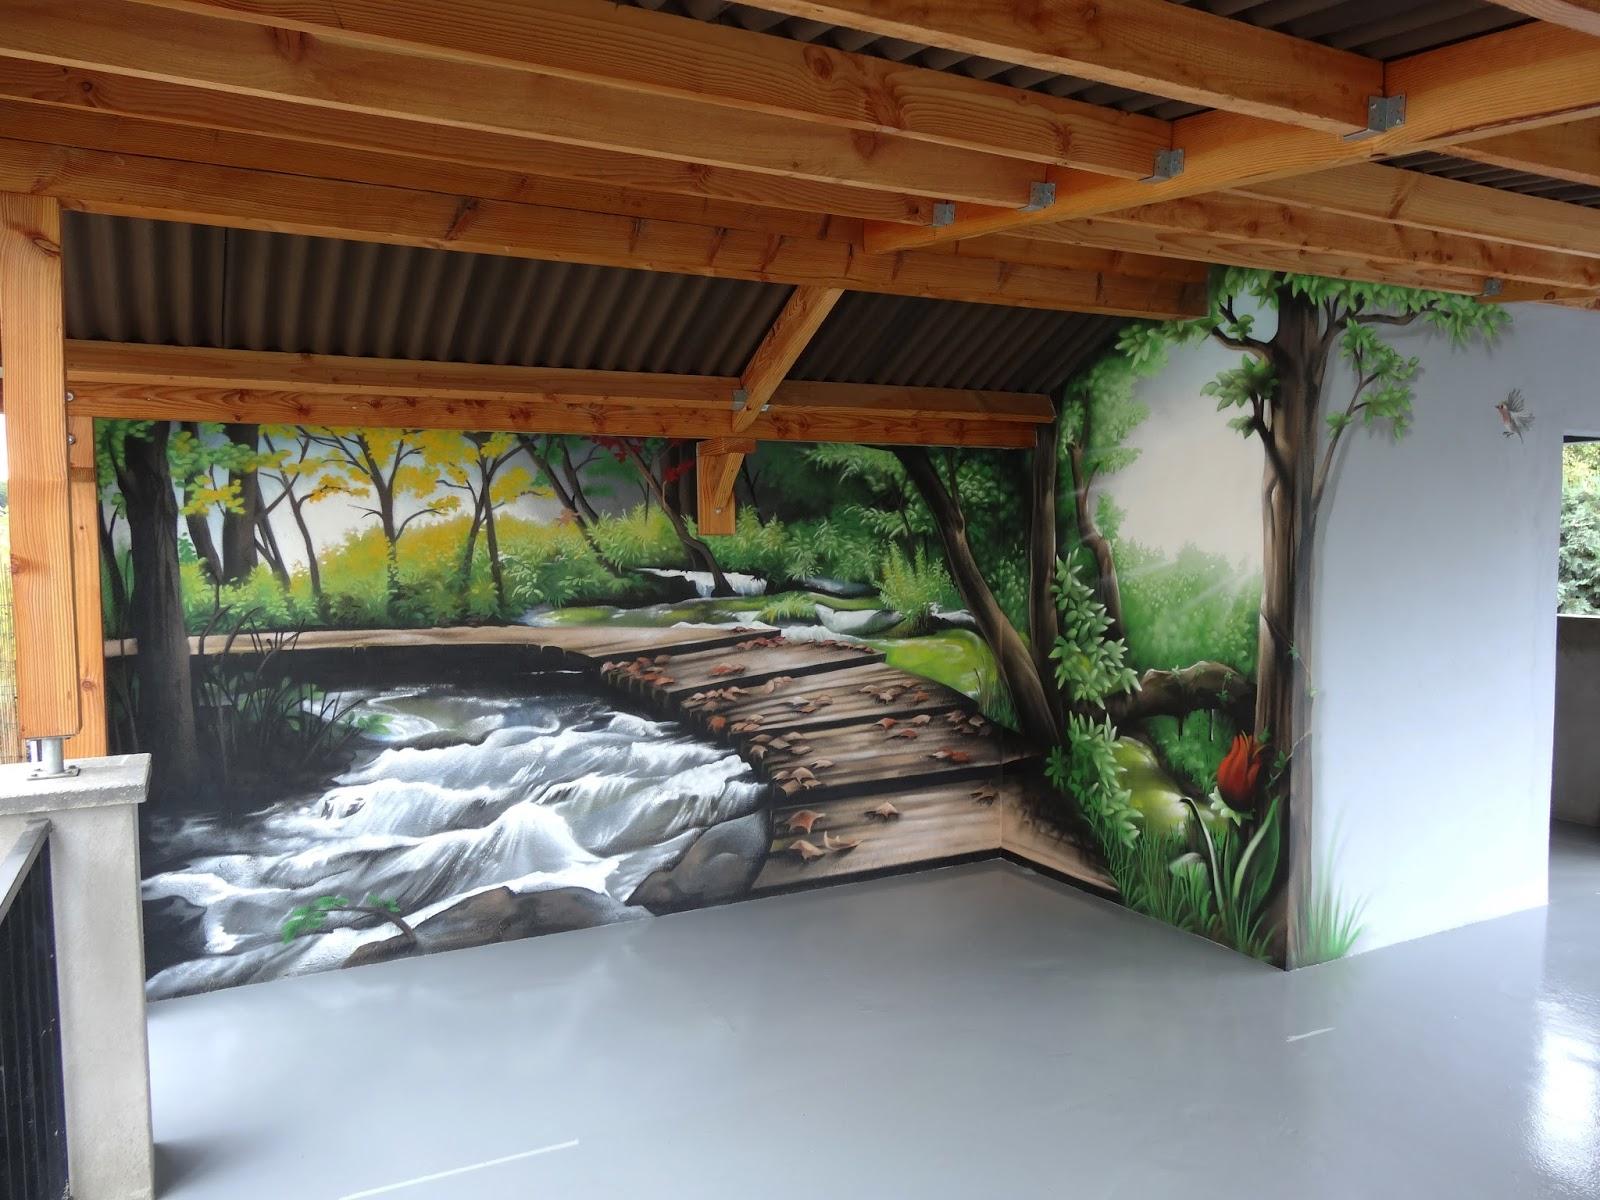 Gimus d coration graffiti terrasse en trompe l 39 oeil Decoration trompe l oeil